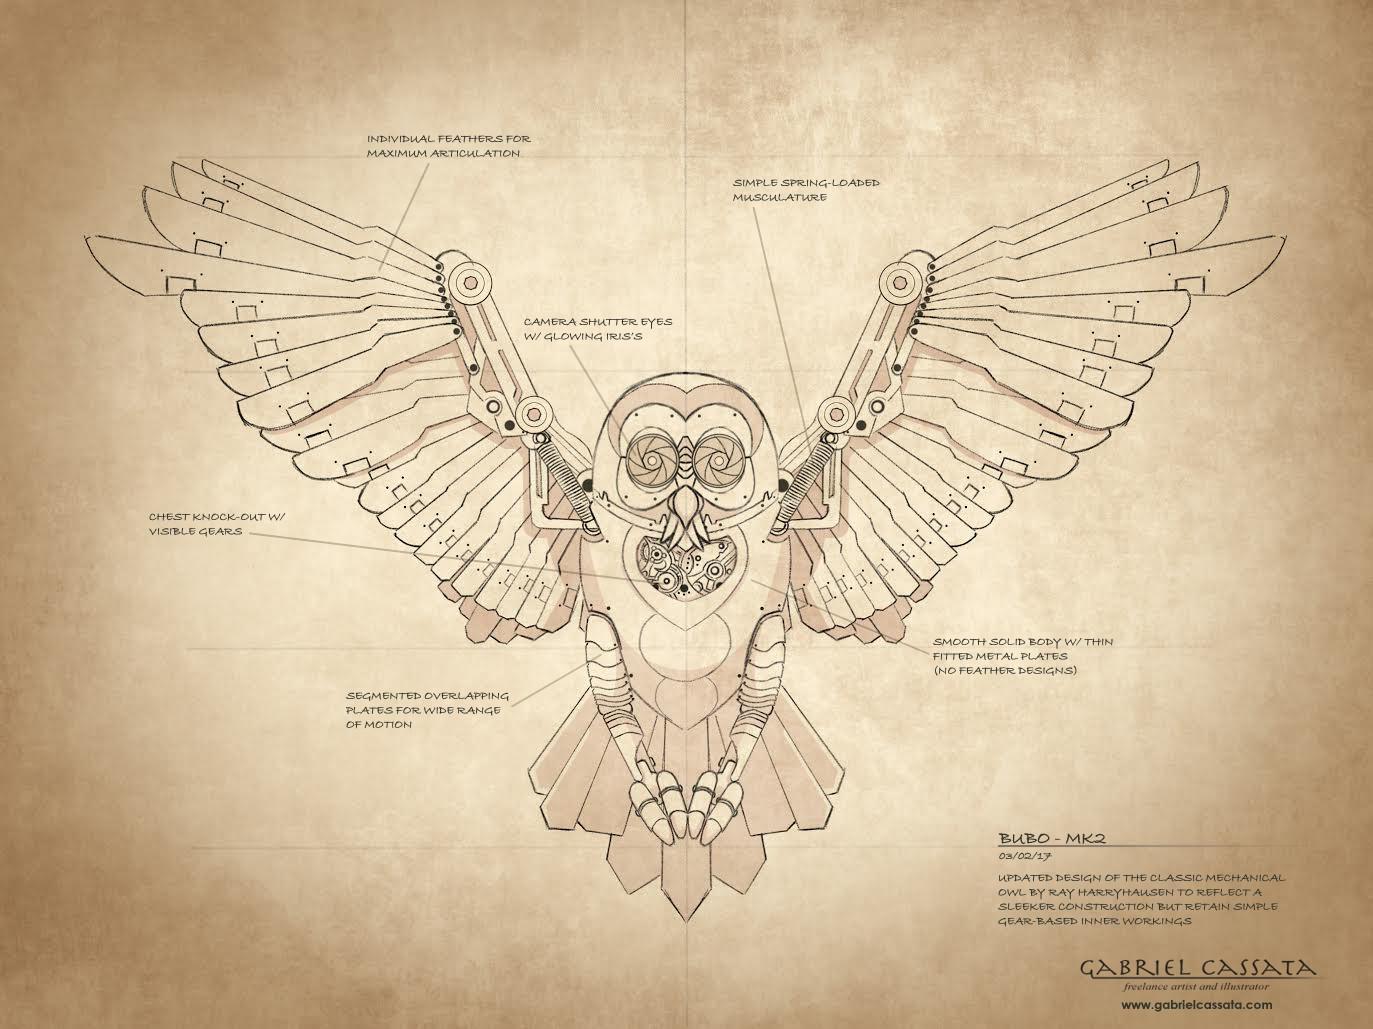 Bubo - MK2 Design Sketch